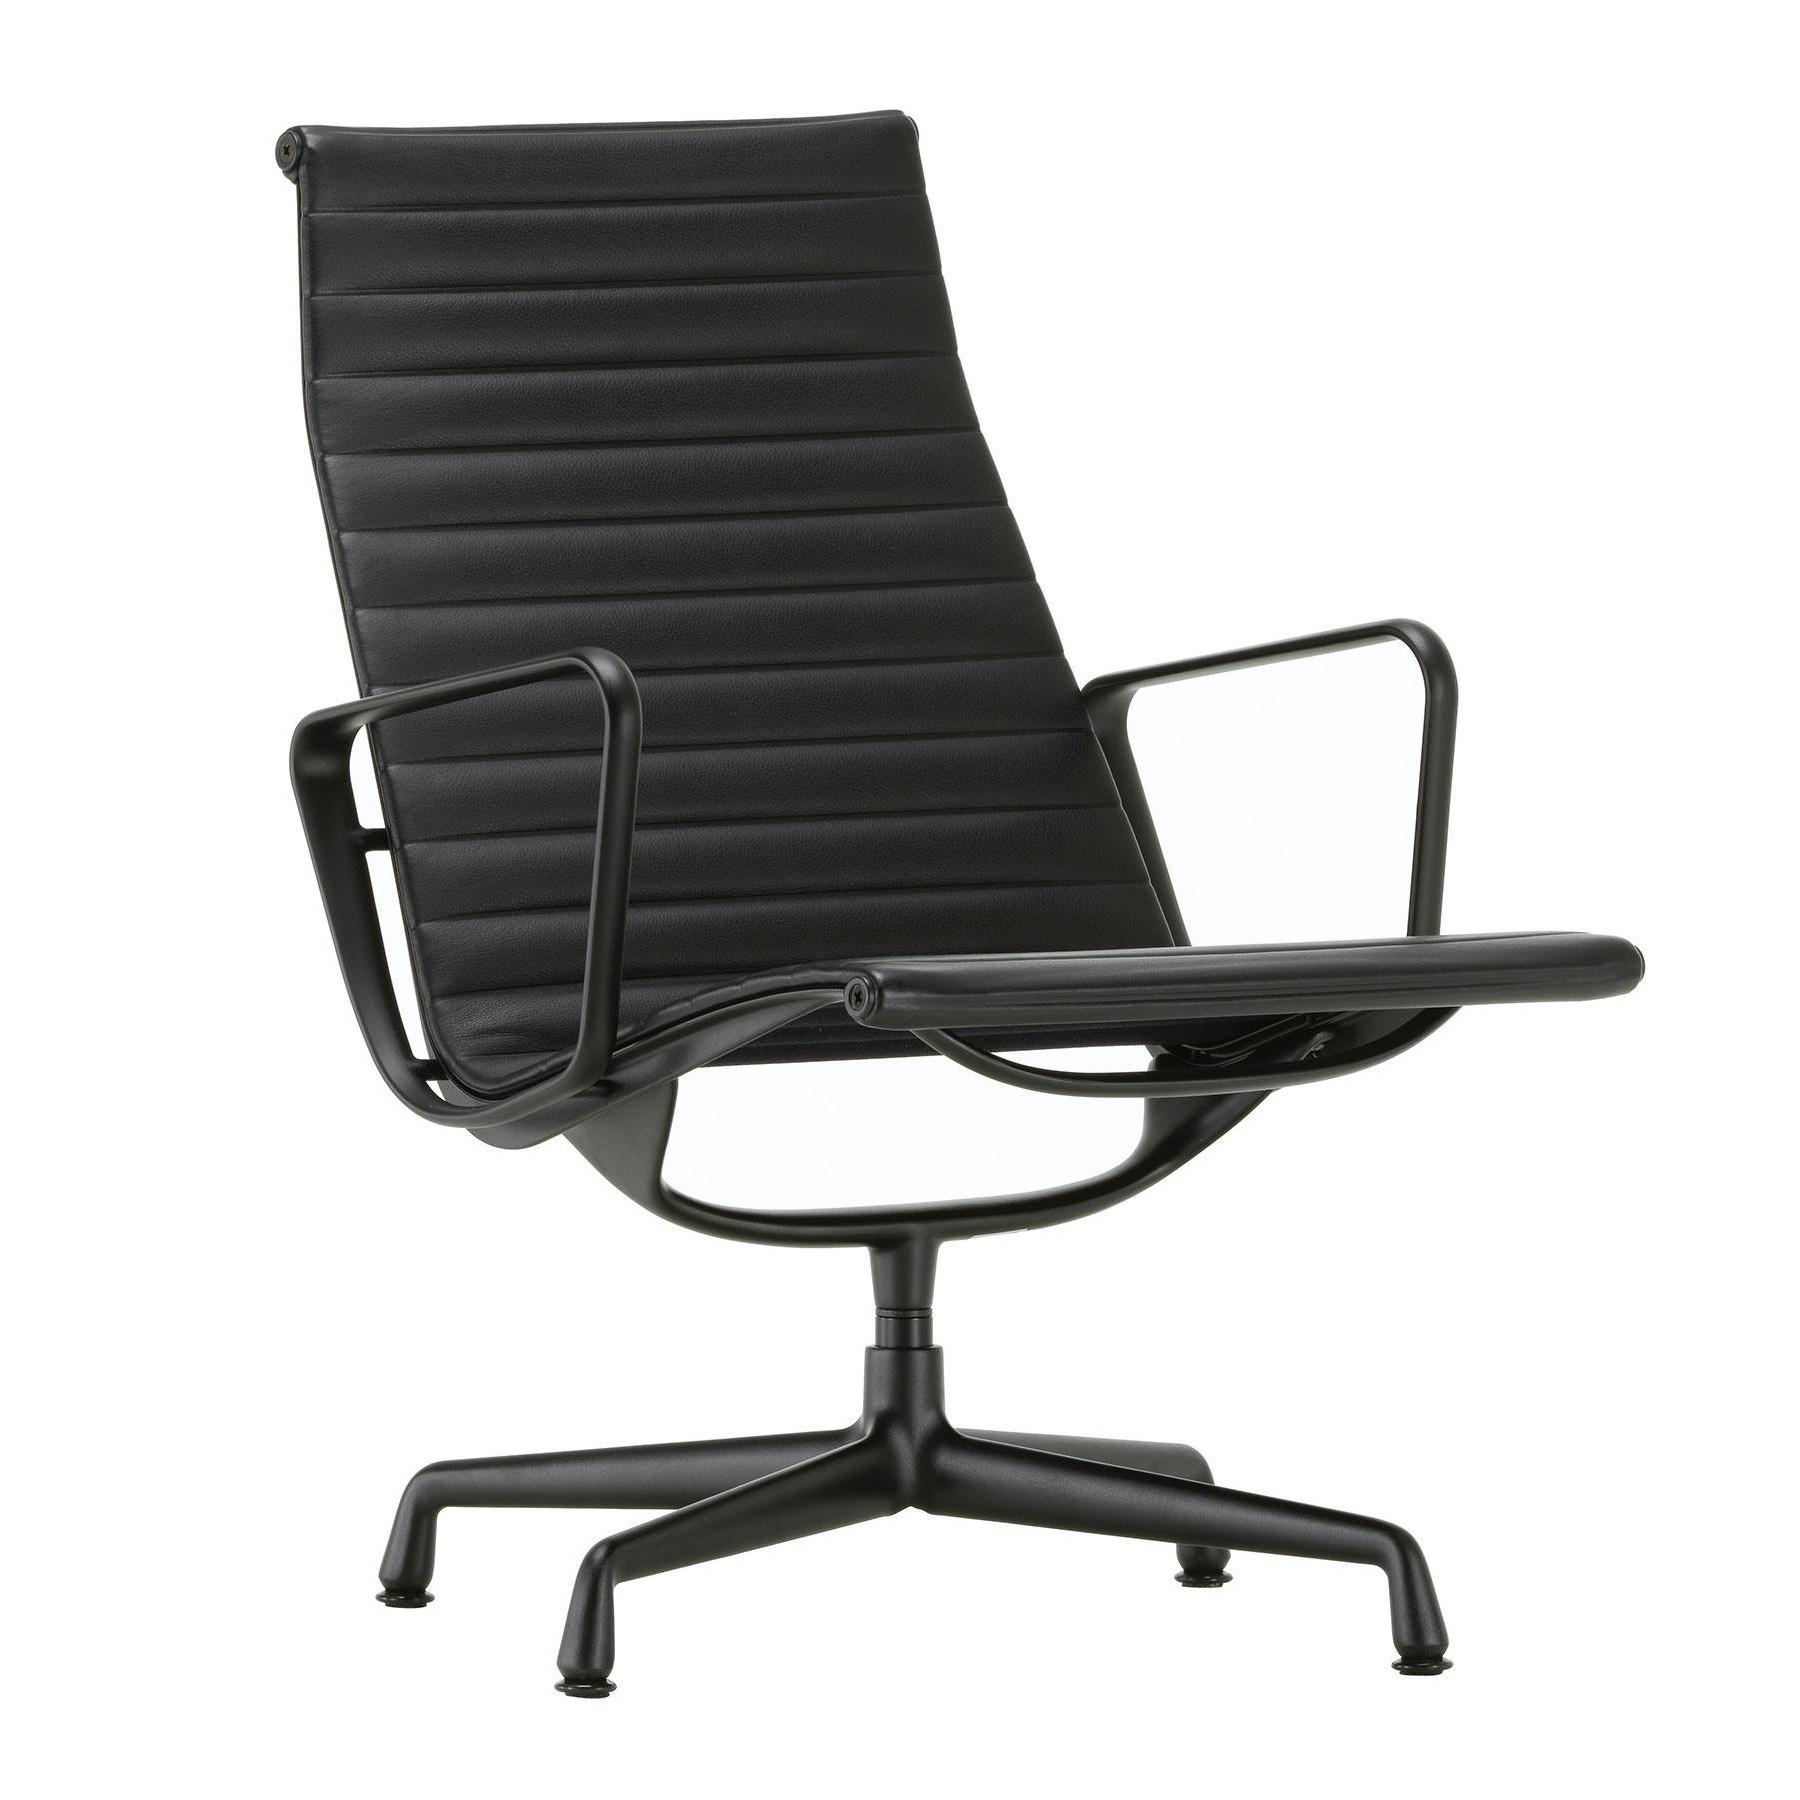 design de qualité dfa0f 2b26e Chaise de bureau EA 116 Aluminium noir